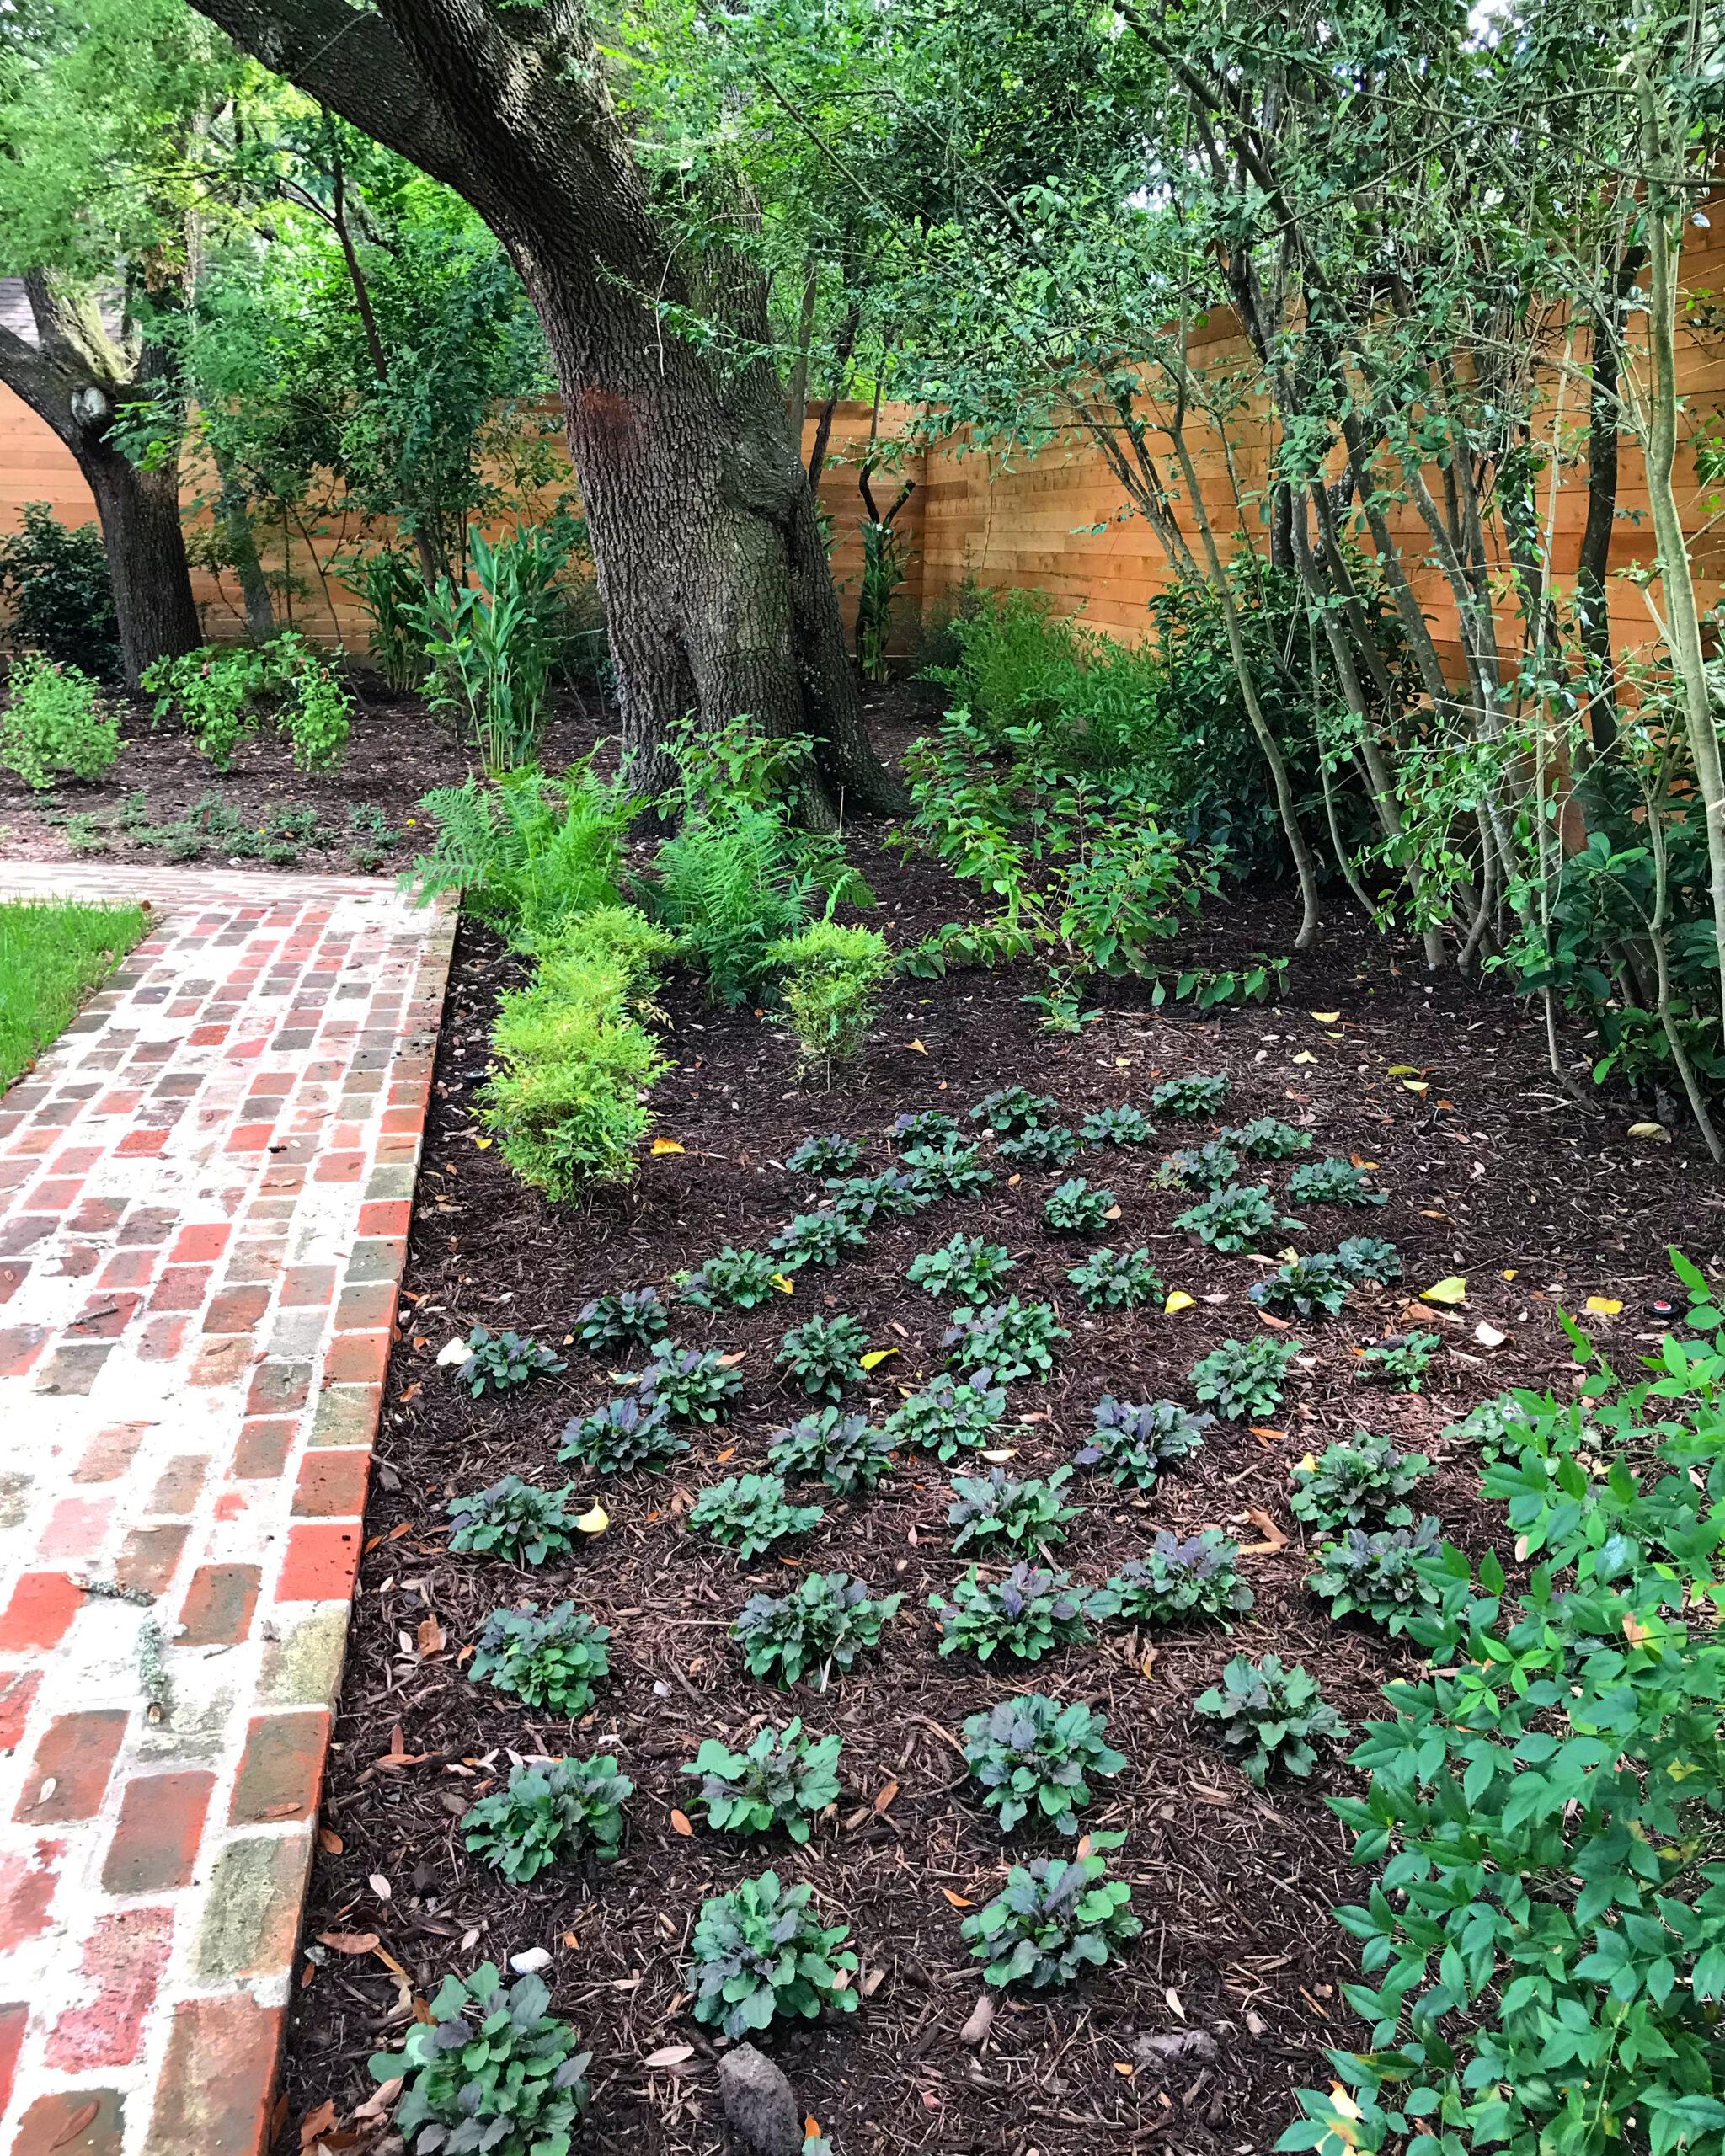 houston woodland garden, houston modern landscaping, houston landscape design, houston modern landscape design,